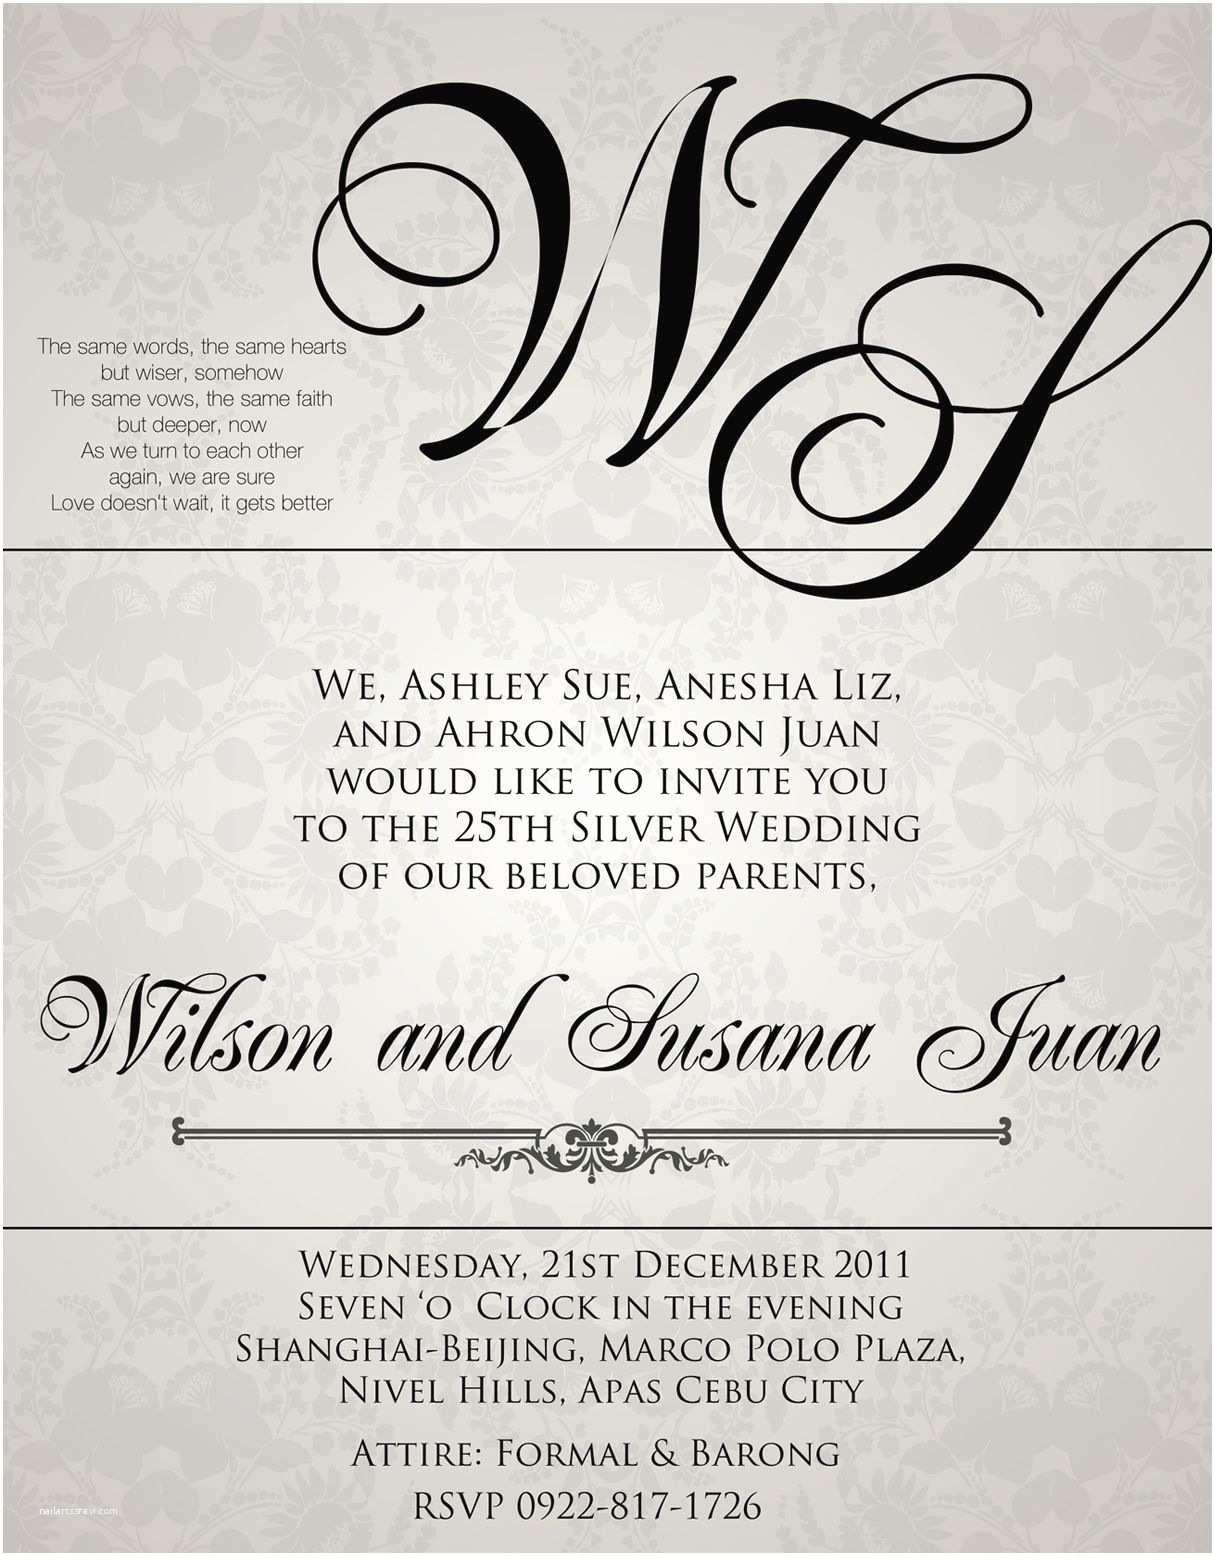 Wedding Invitation Philippines Sample Wedding Invitation Wording In the Philippines